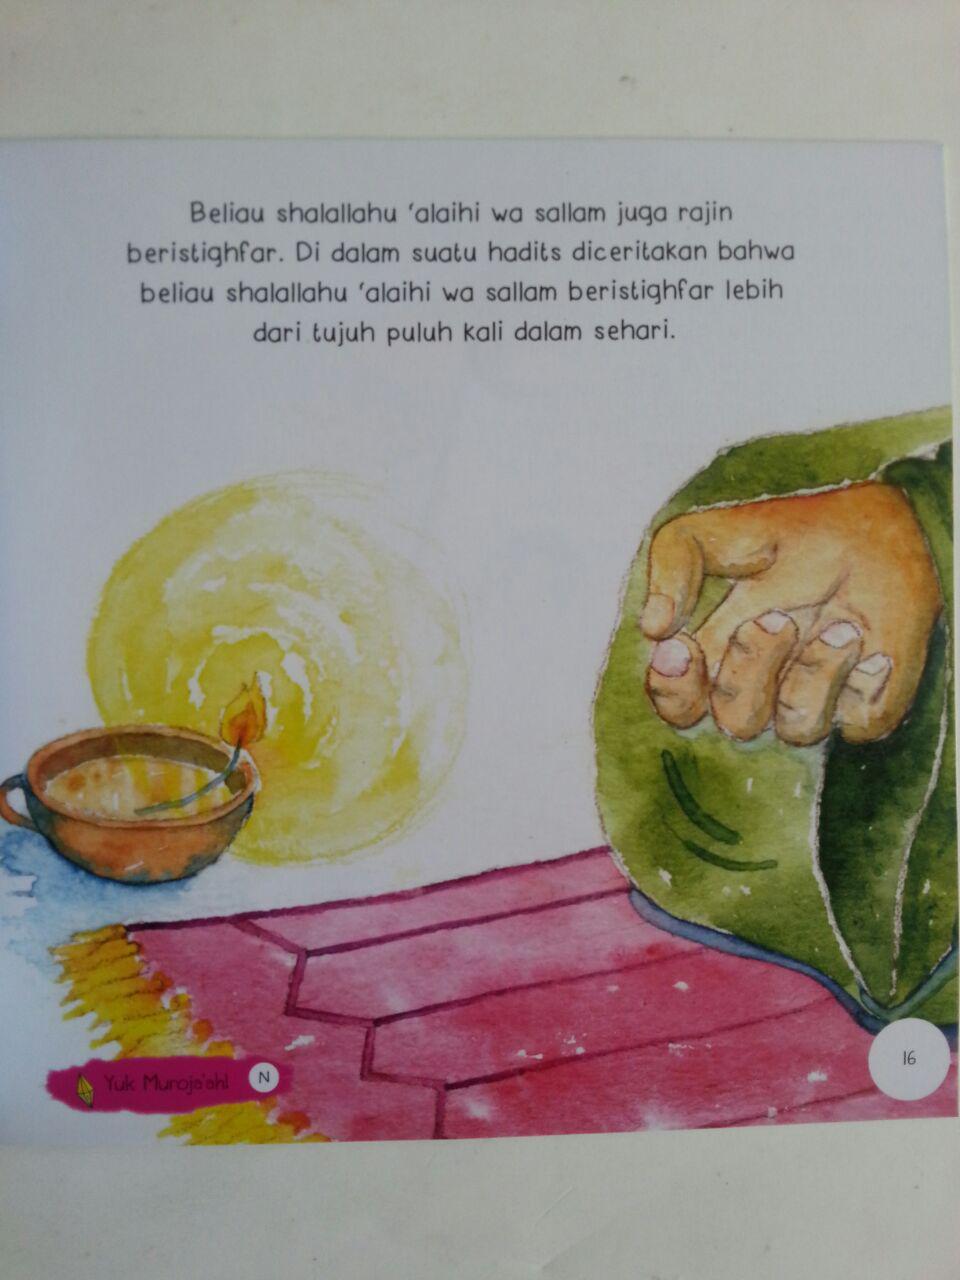 Buku Anak Seri Ushul Tsalatsah For Kids Mengenal Rasulullah isi 2